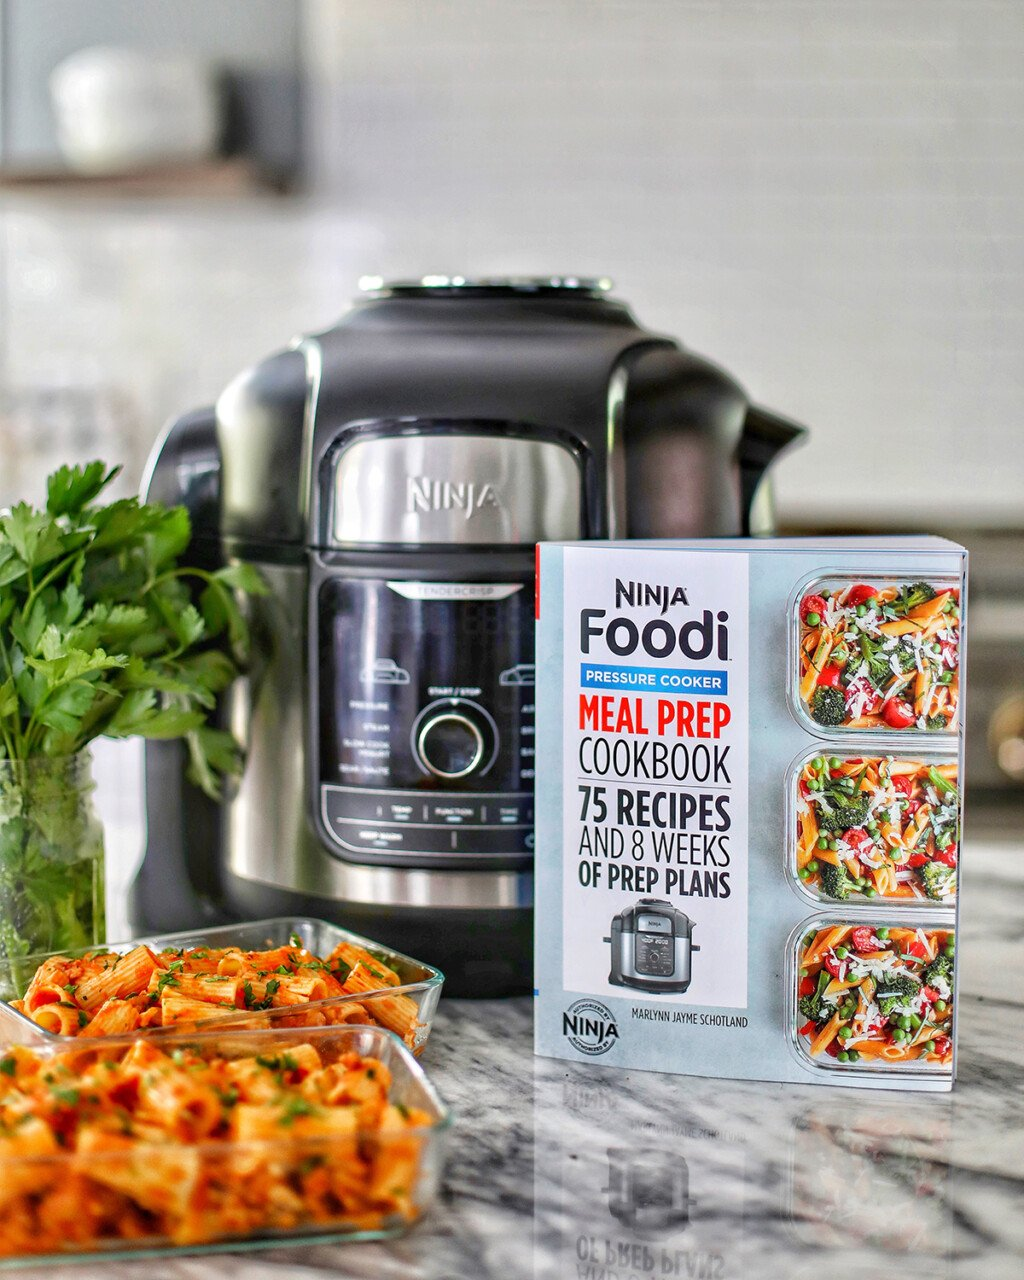 Ninja Foodi Cookbook with Foodi and pasta